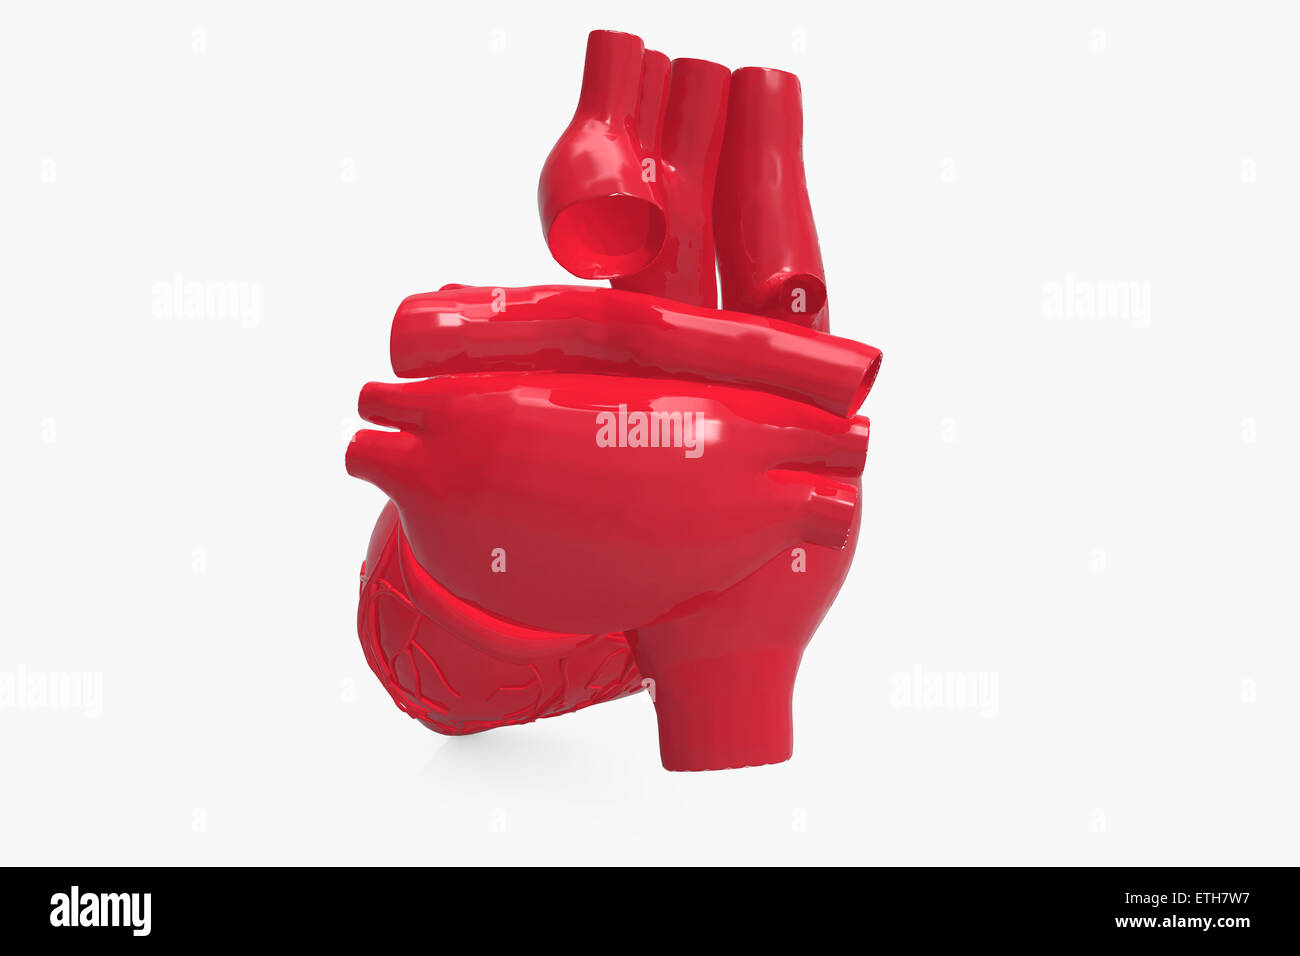 Human Heart - Stock Image